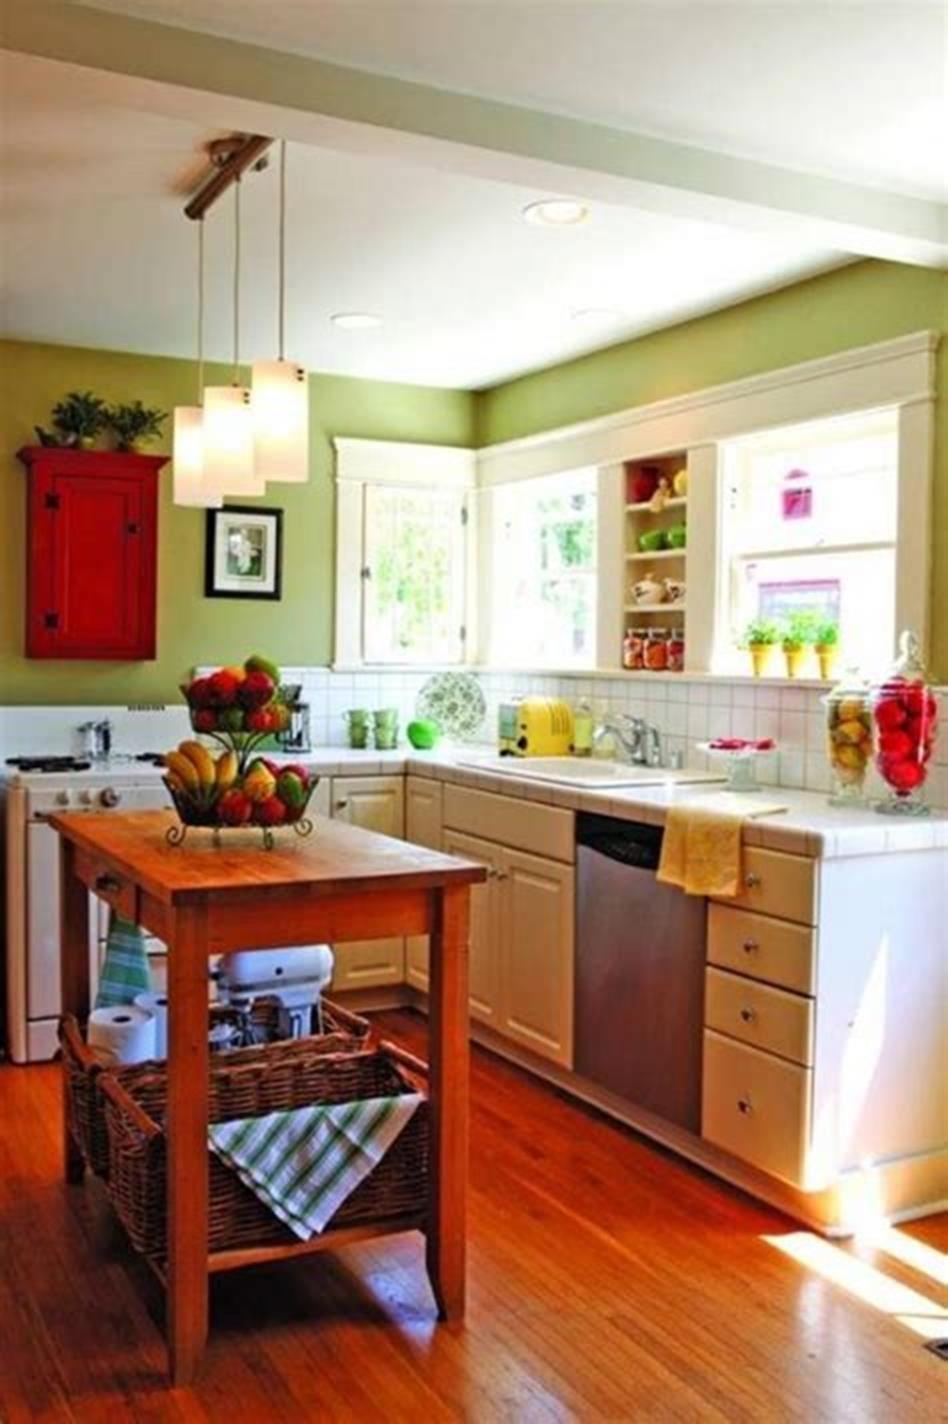 46 most popular kitchen color schemes trends 2019 colorful kitchen decor small kitchen small on kitchen paint colors id=65235